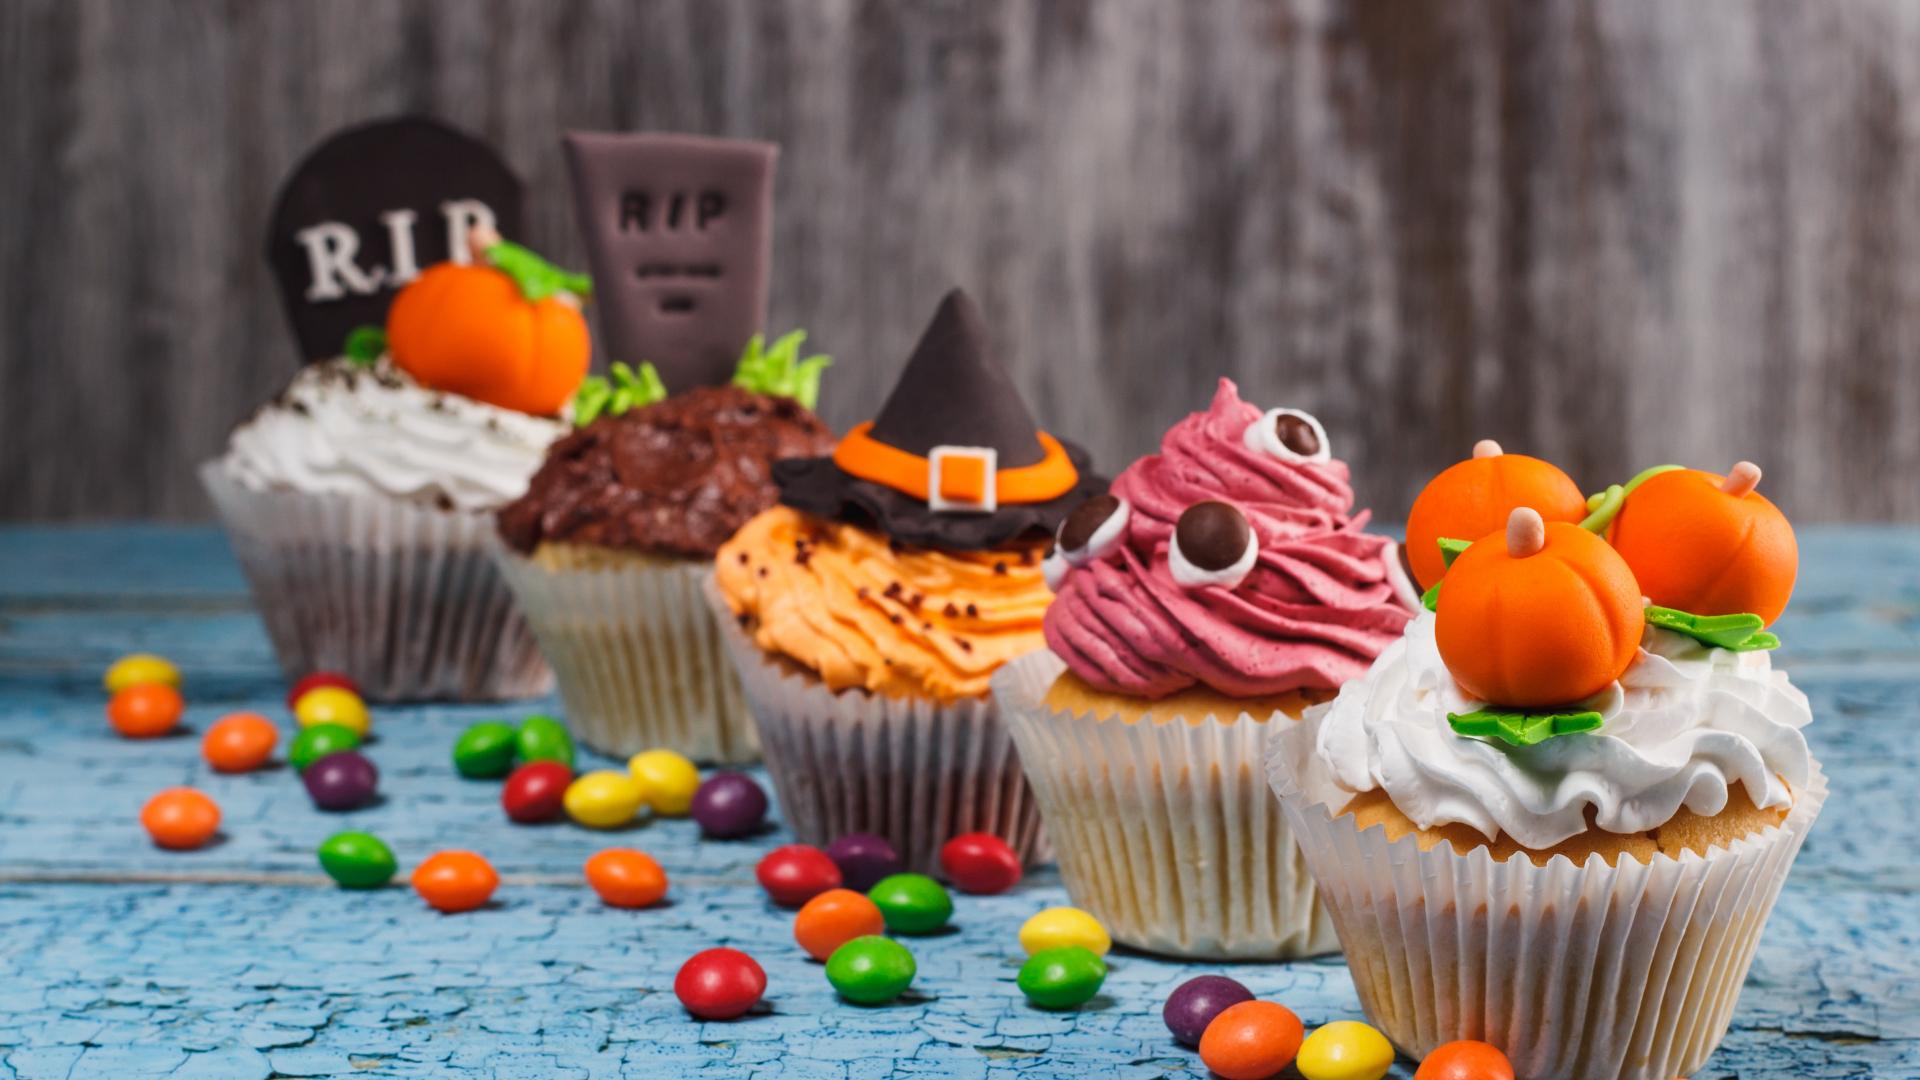 download 1920x1080 wallpaper halloween, cake, cupcakes, dessert